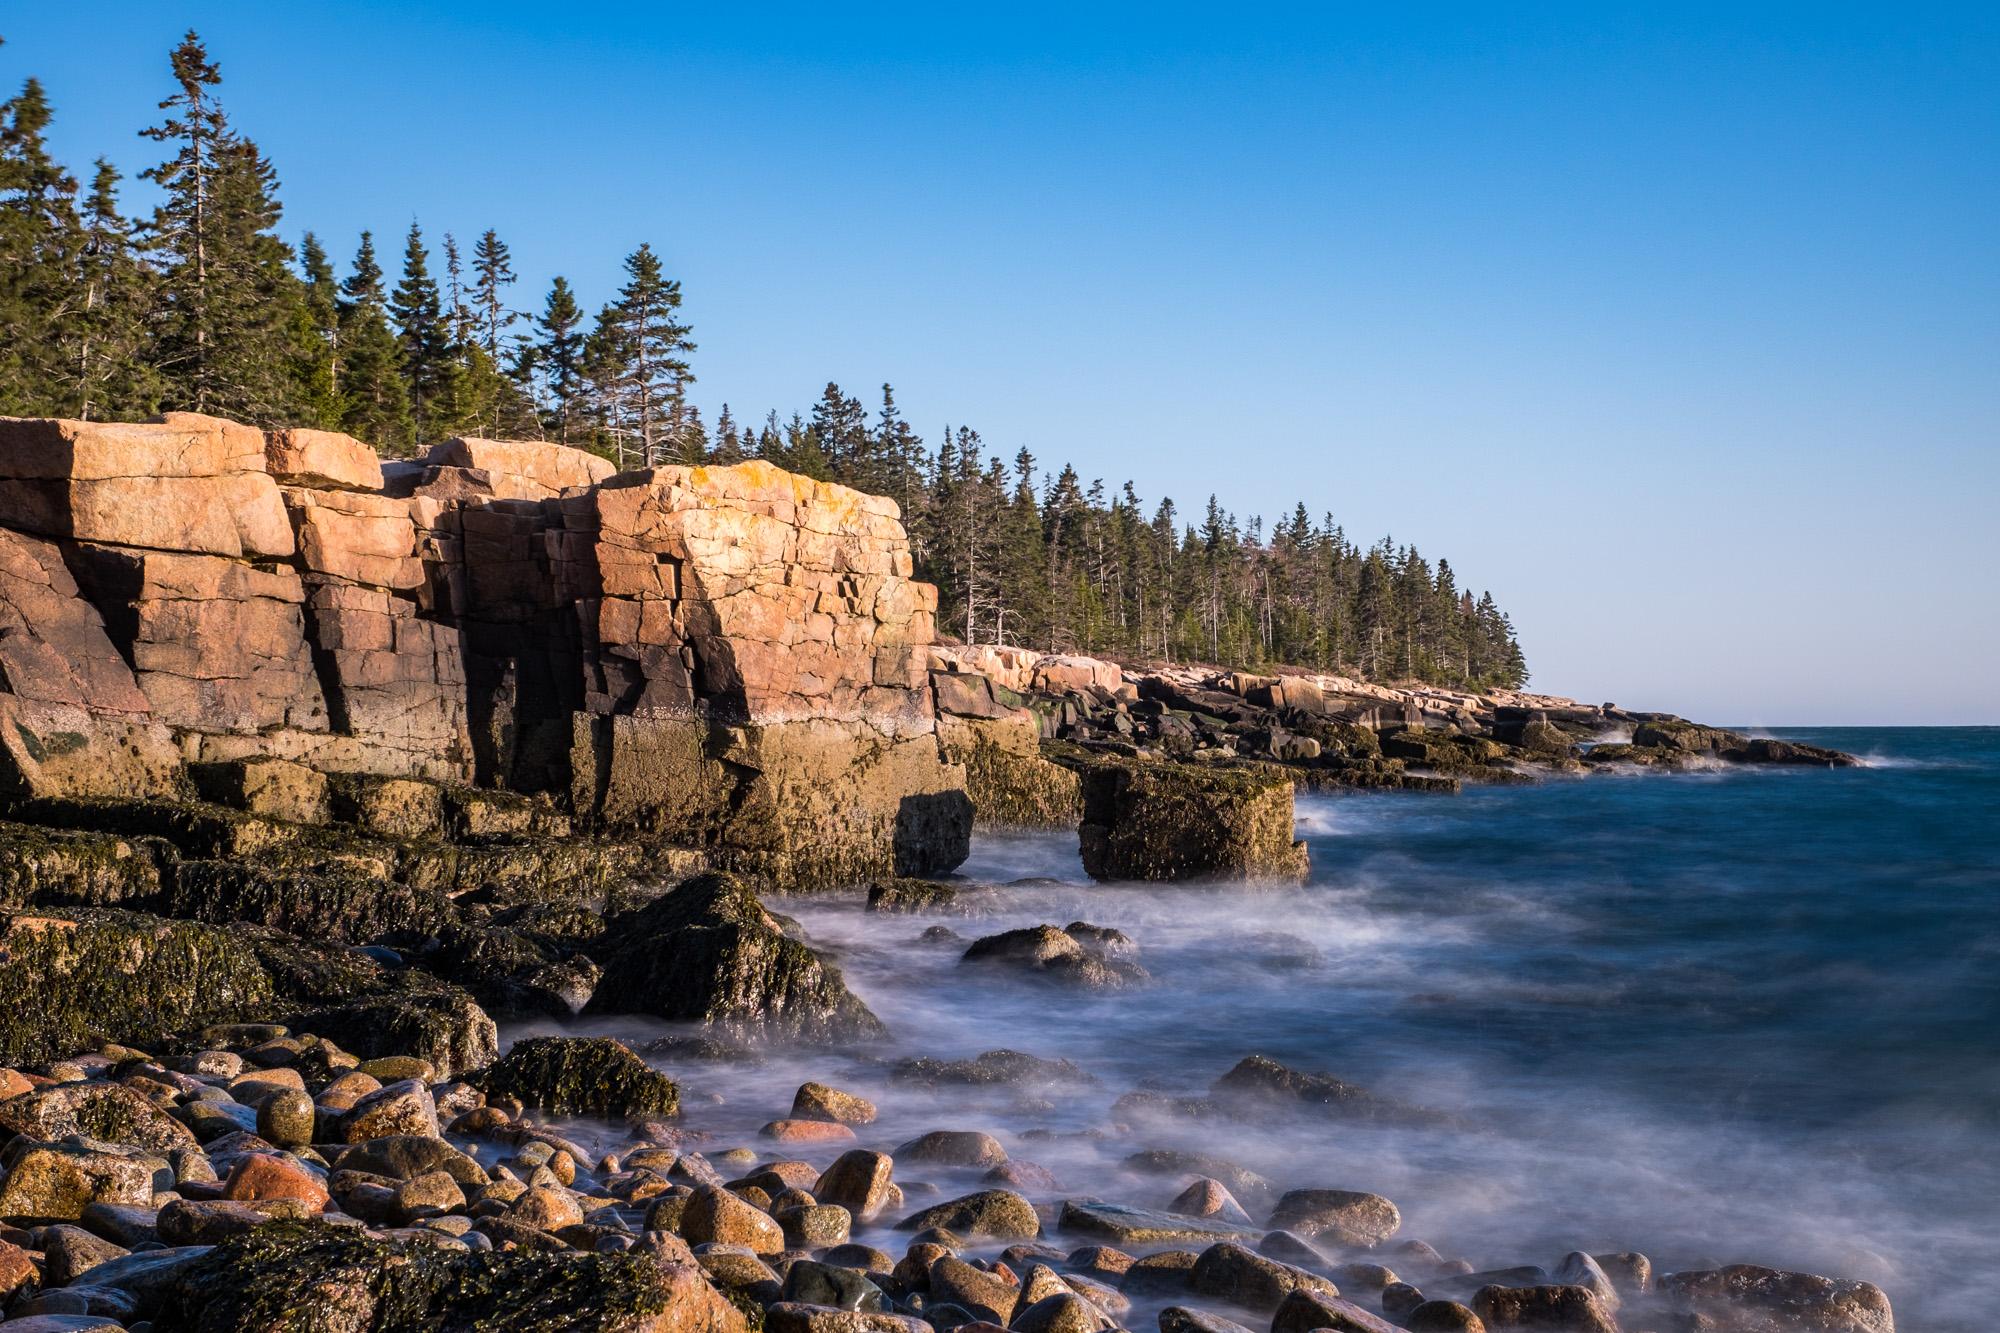 Same typical Maine rocky coastline...